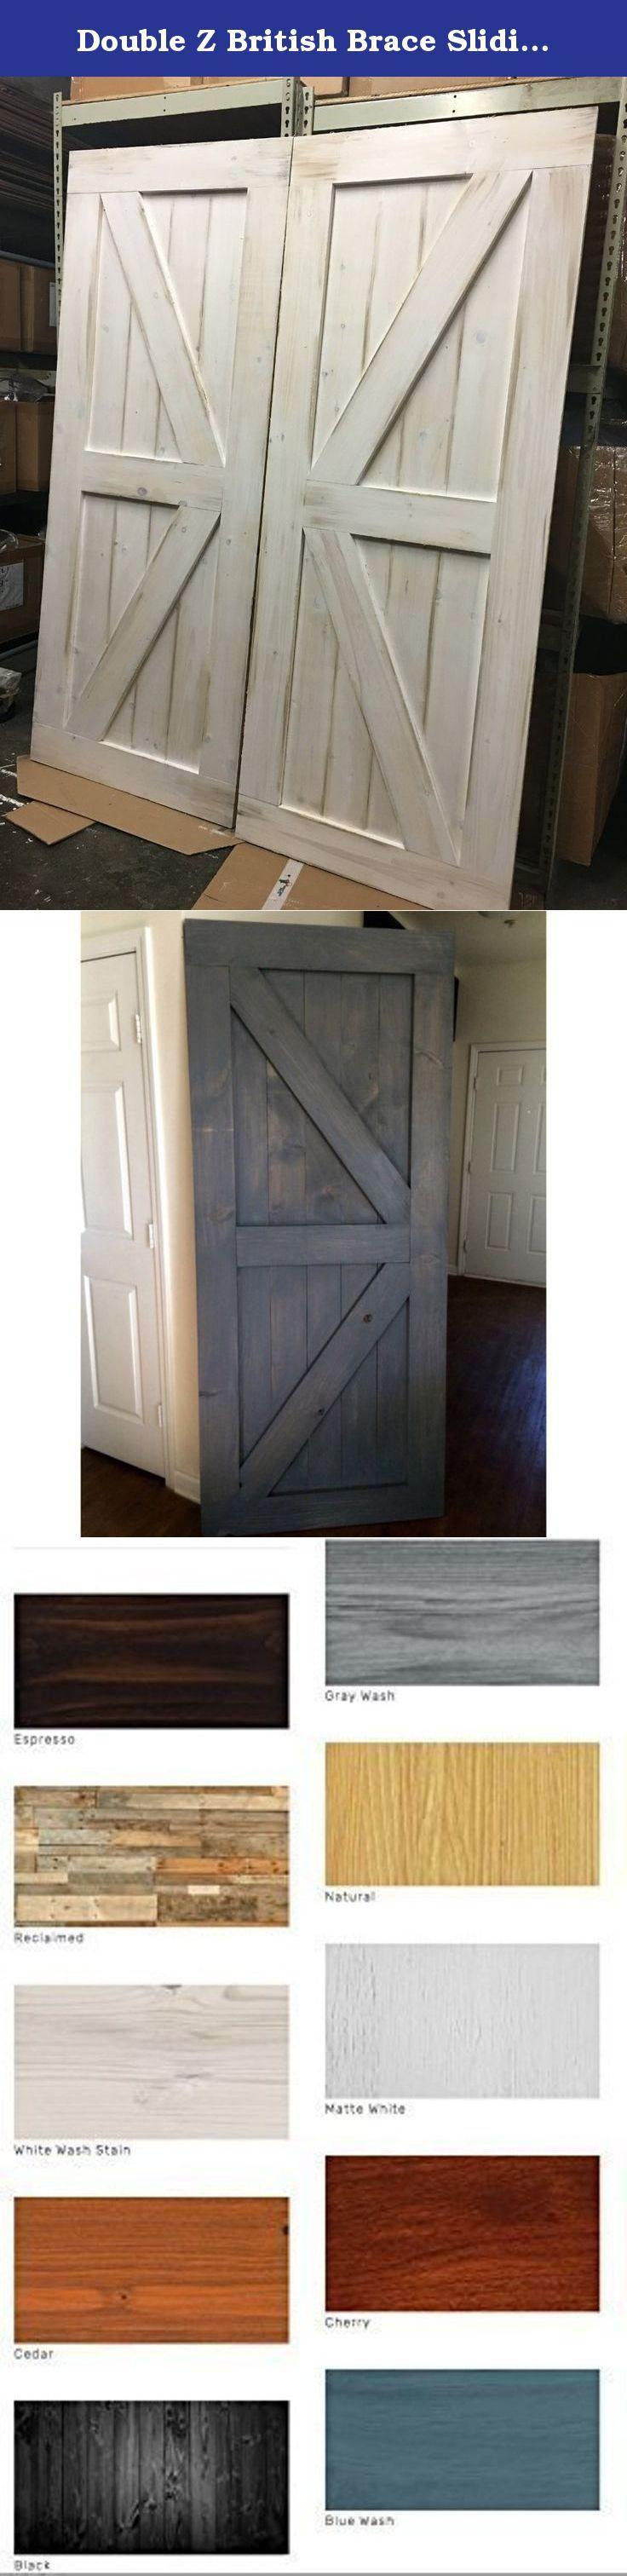 Barn door hardware rlp v track rectangular hanger reclaimed lumber - Double Z British Brace Sliding Barn Door Features A Double Z Pattern On Both Top